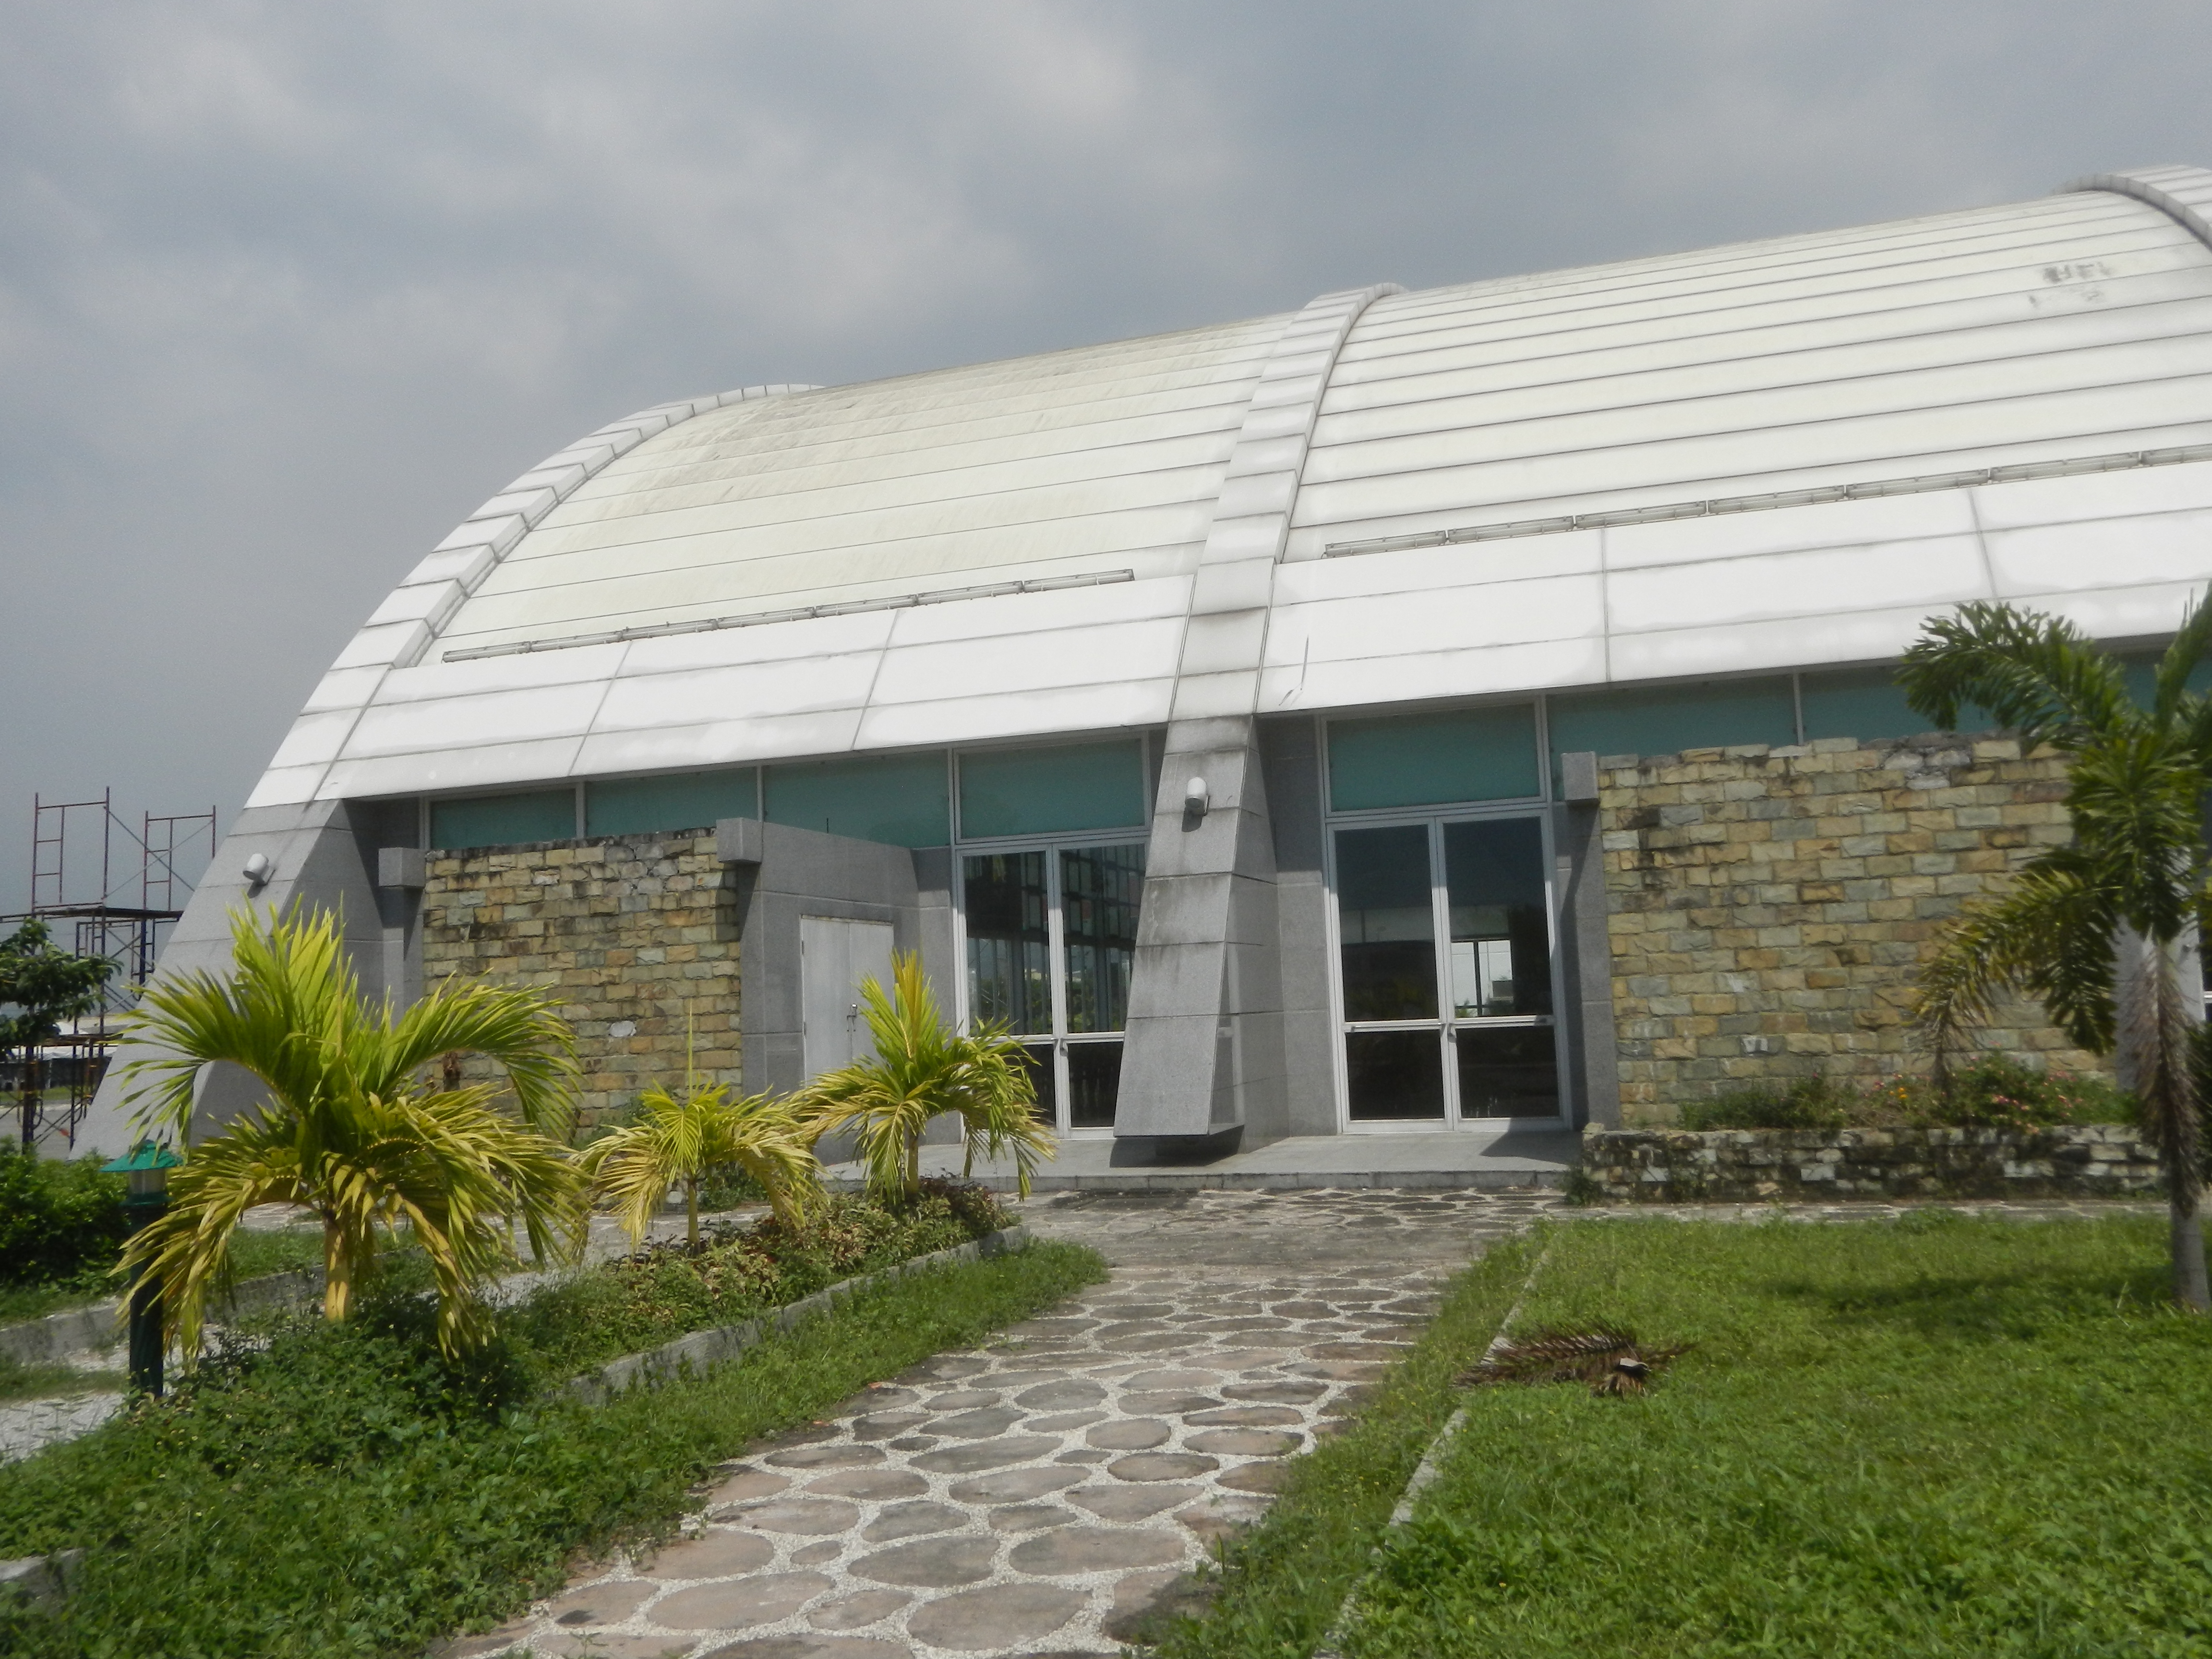 File:2632El Shaddai International House Of Prayer Parañaque City 29